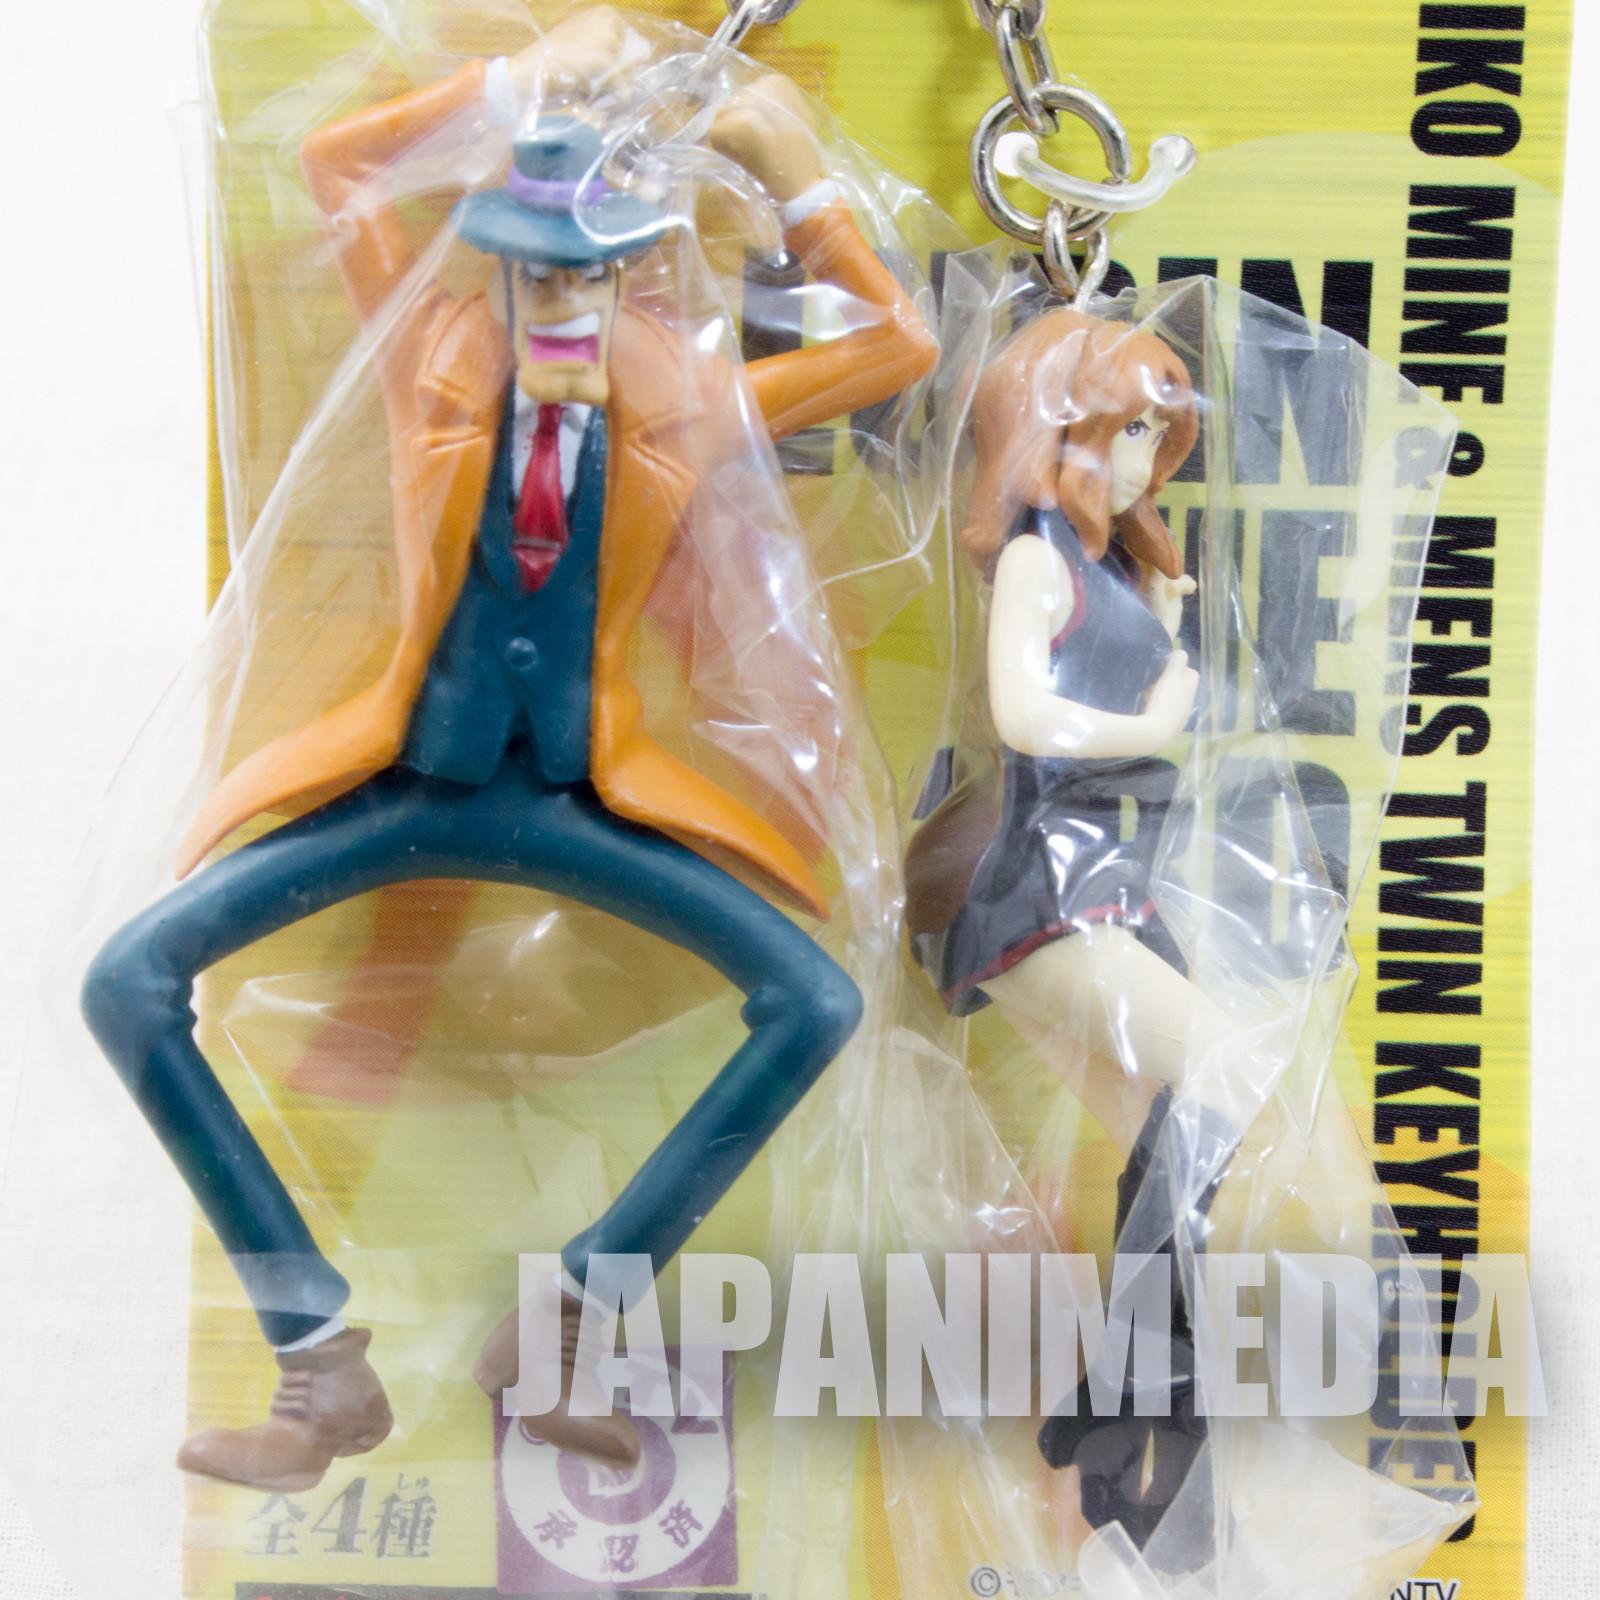 Lupin the Third (3rd) Zenigata & Fujiko Mine Figure Keychain Banpresto JAPAN